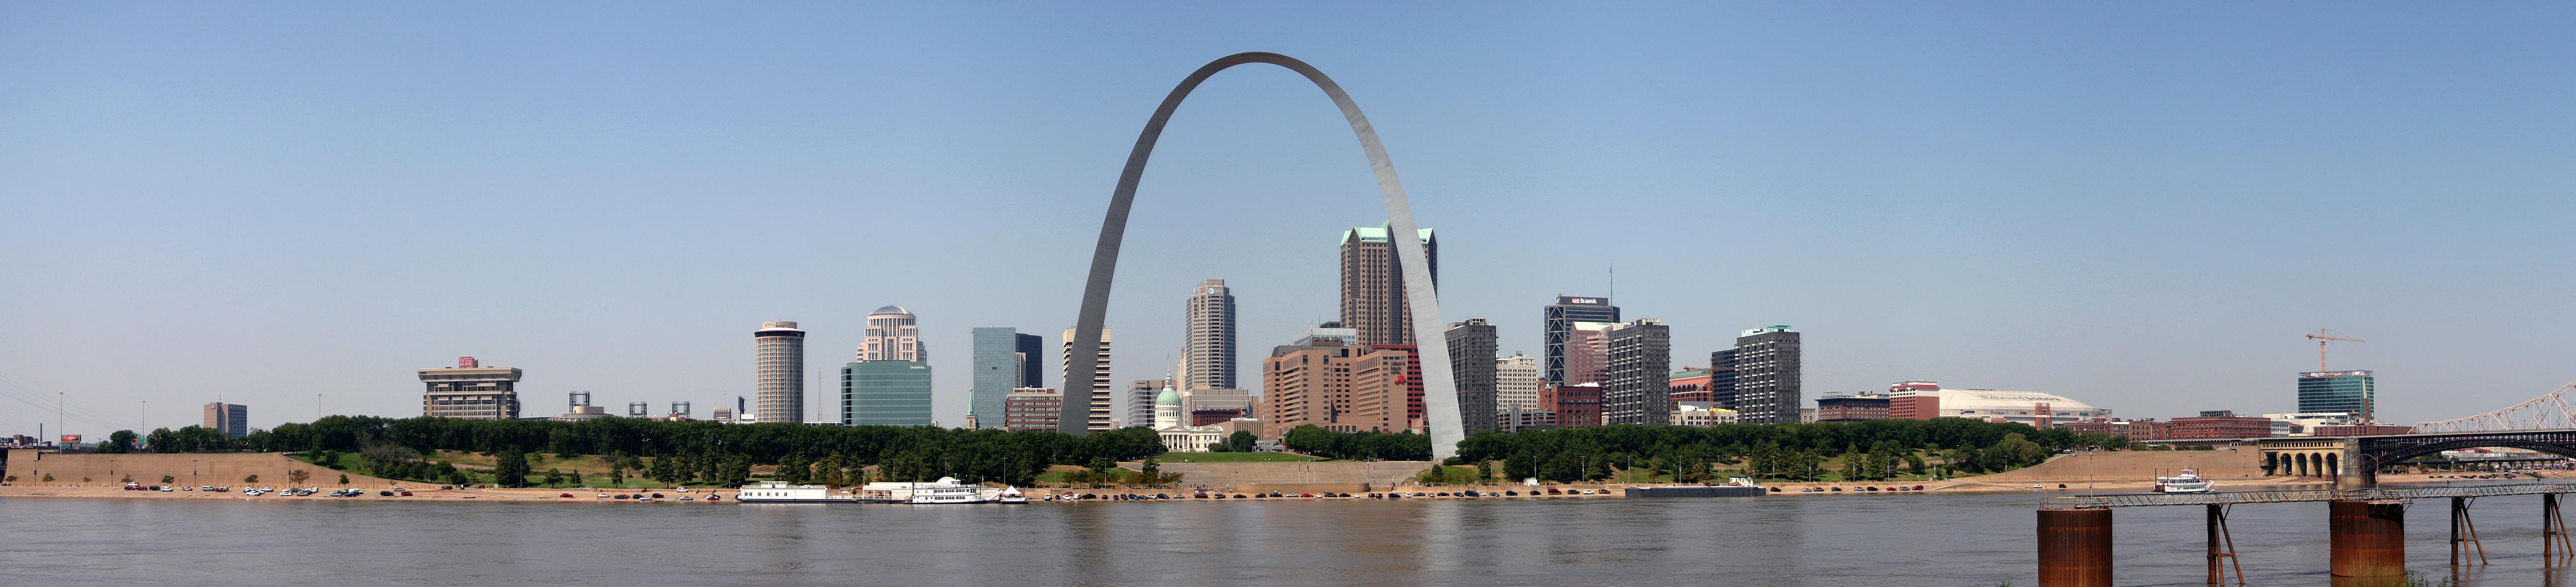 US Postal Service Salaries in St. Louis, MO | Glassdoor